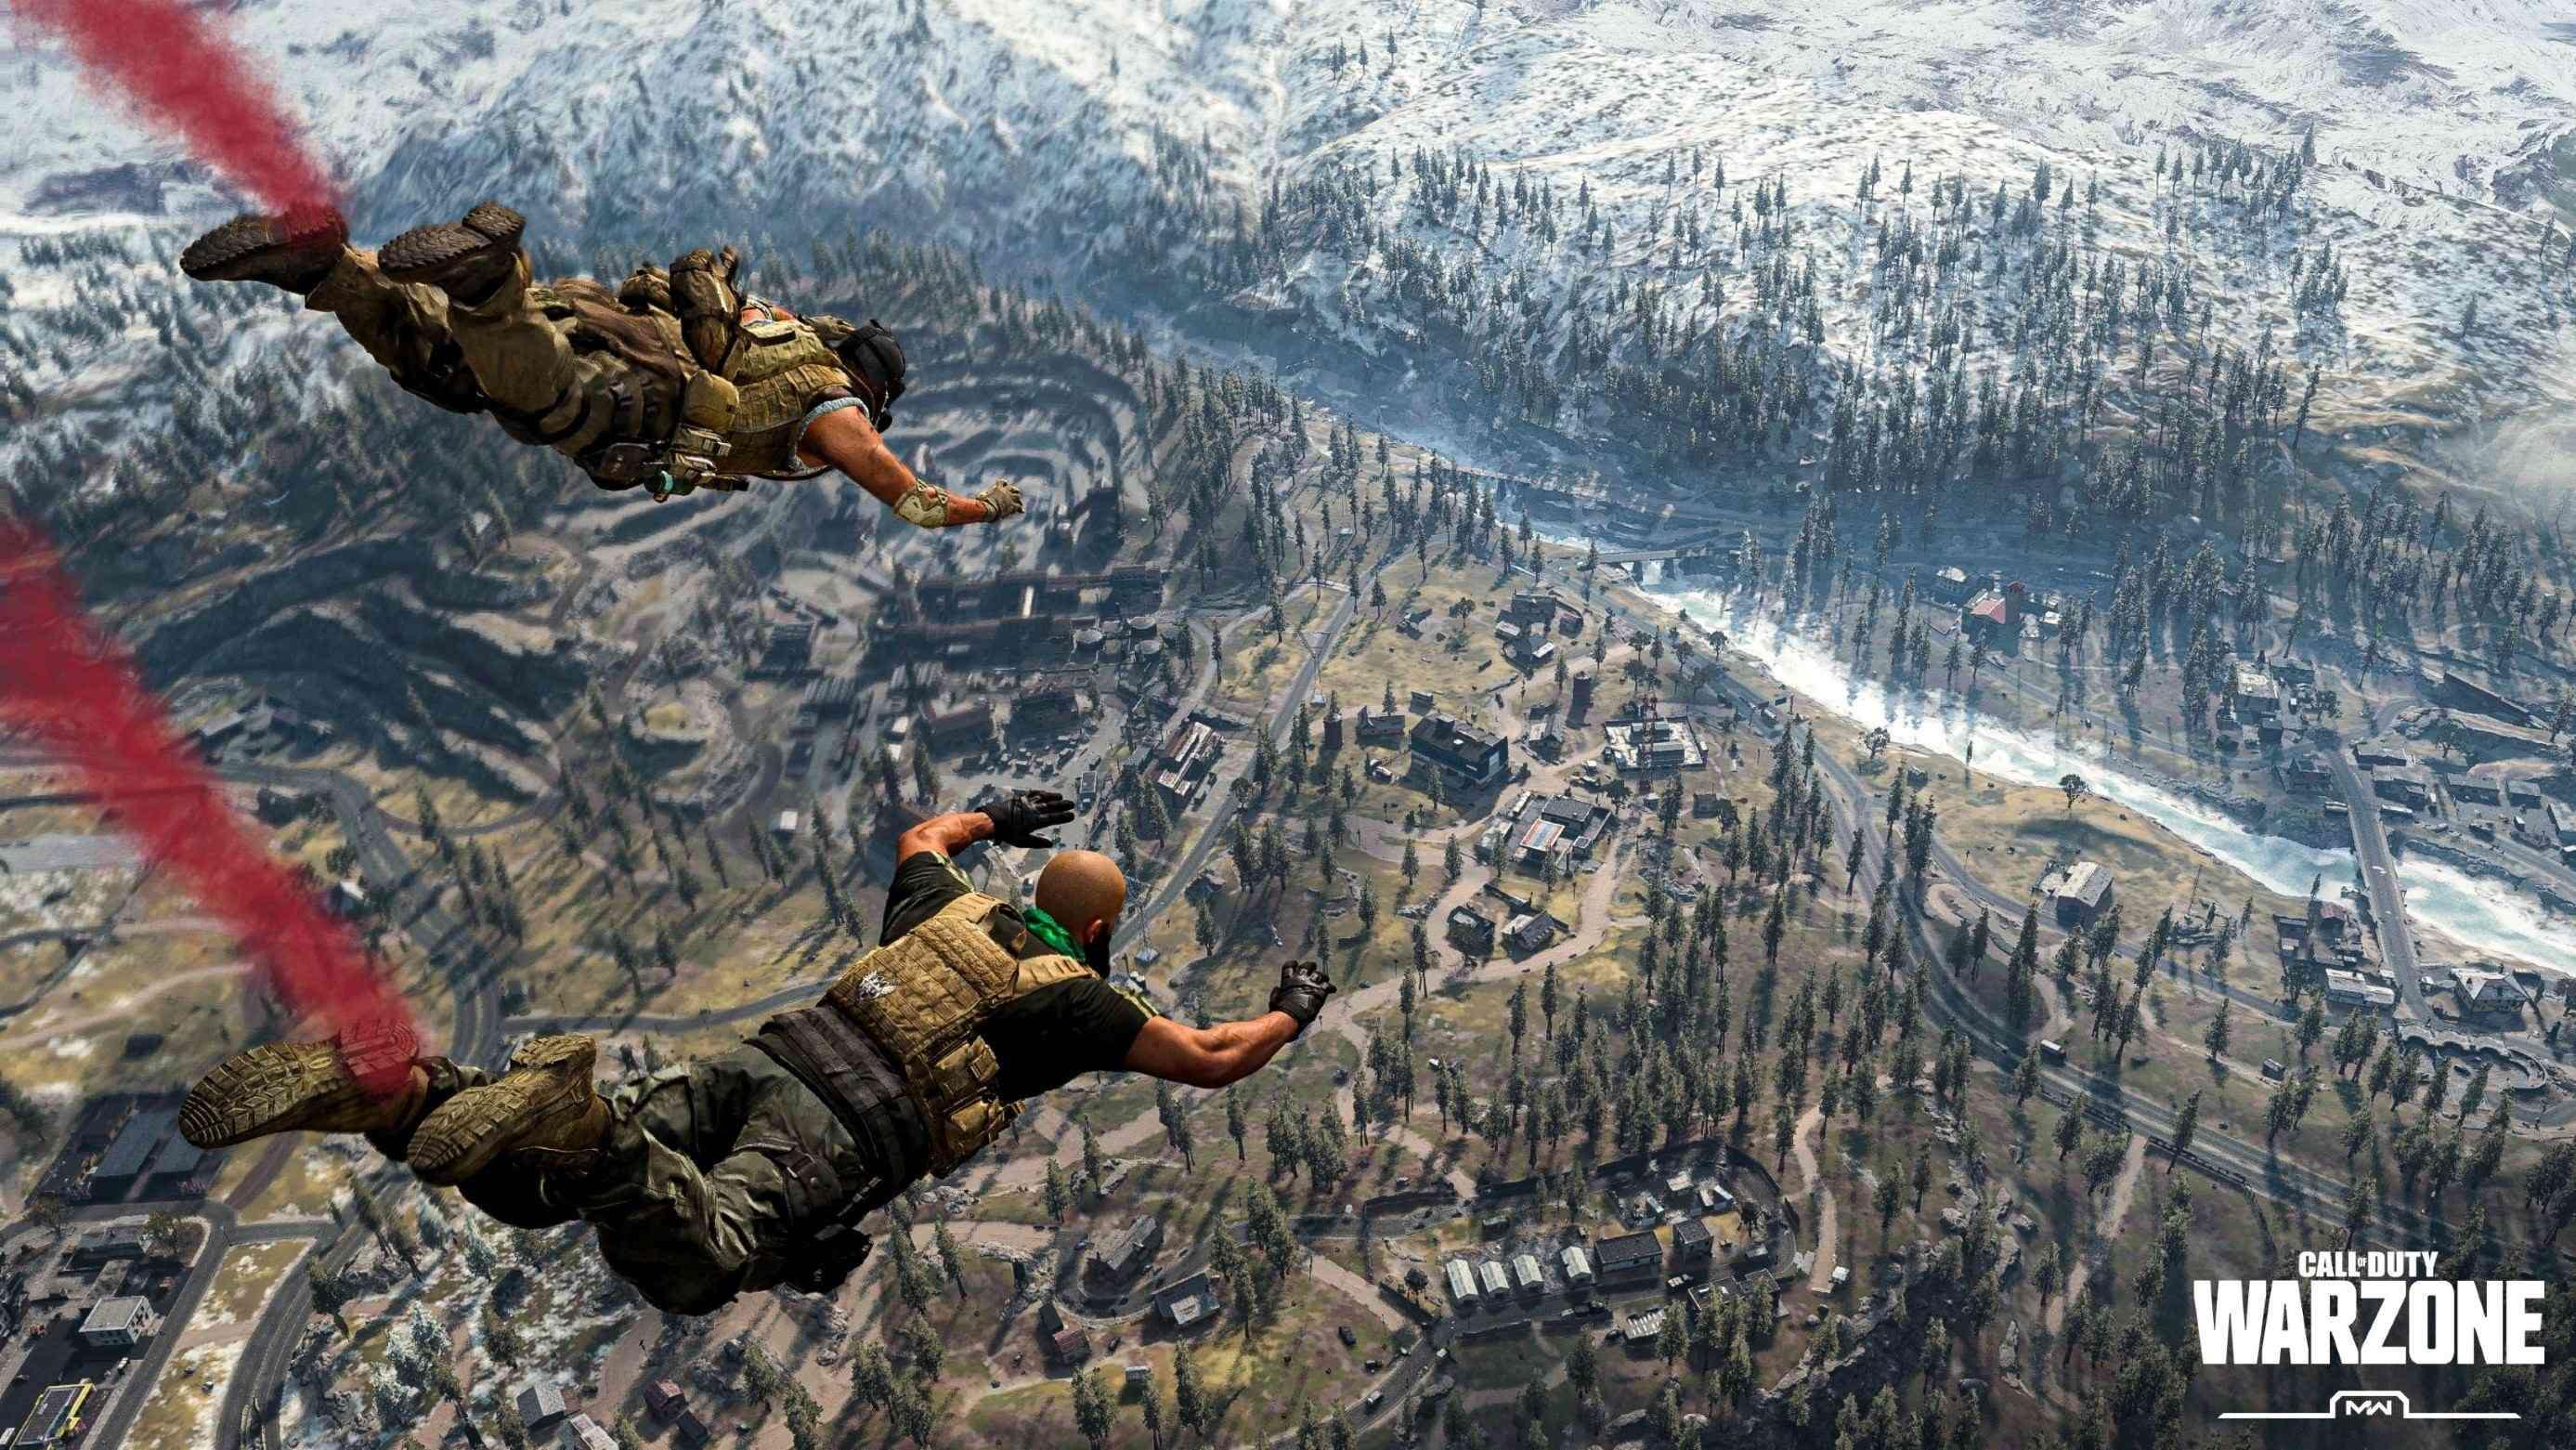 Call of Duty Warzone – Bild 10